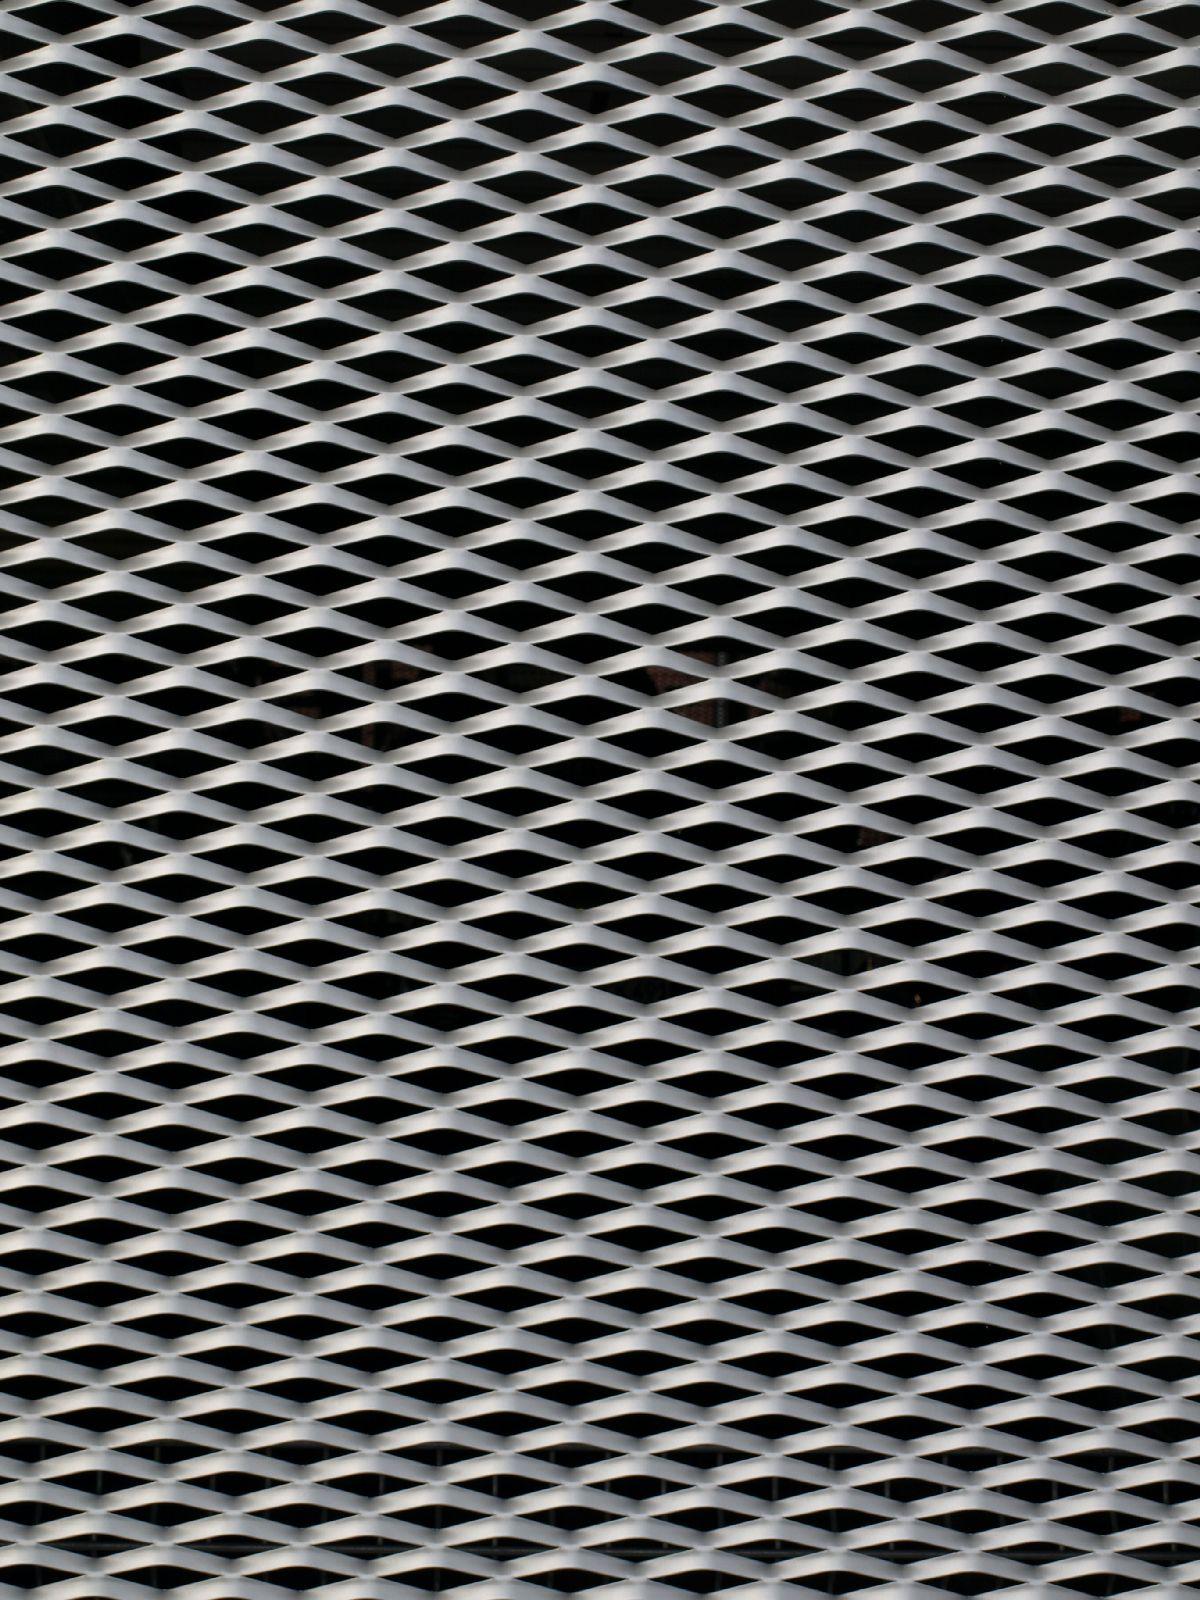 Metall_Textur_A_P4110681